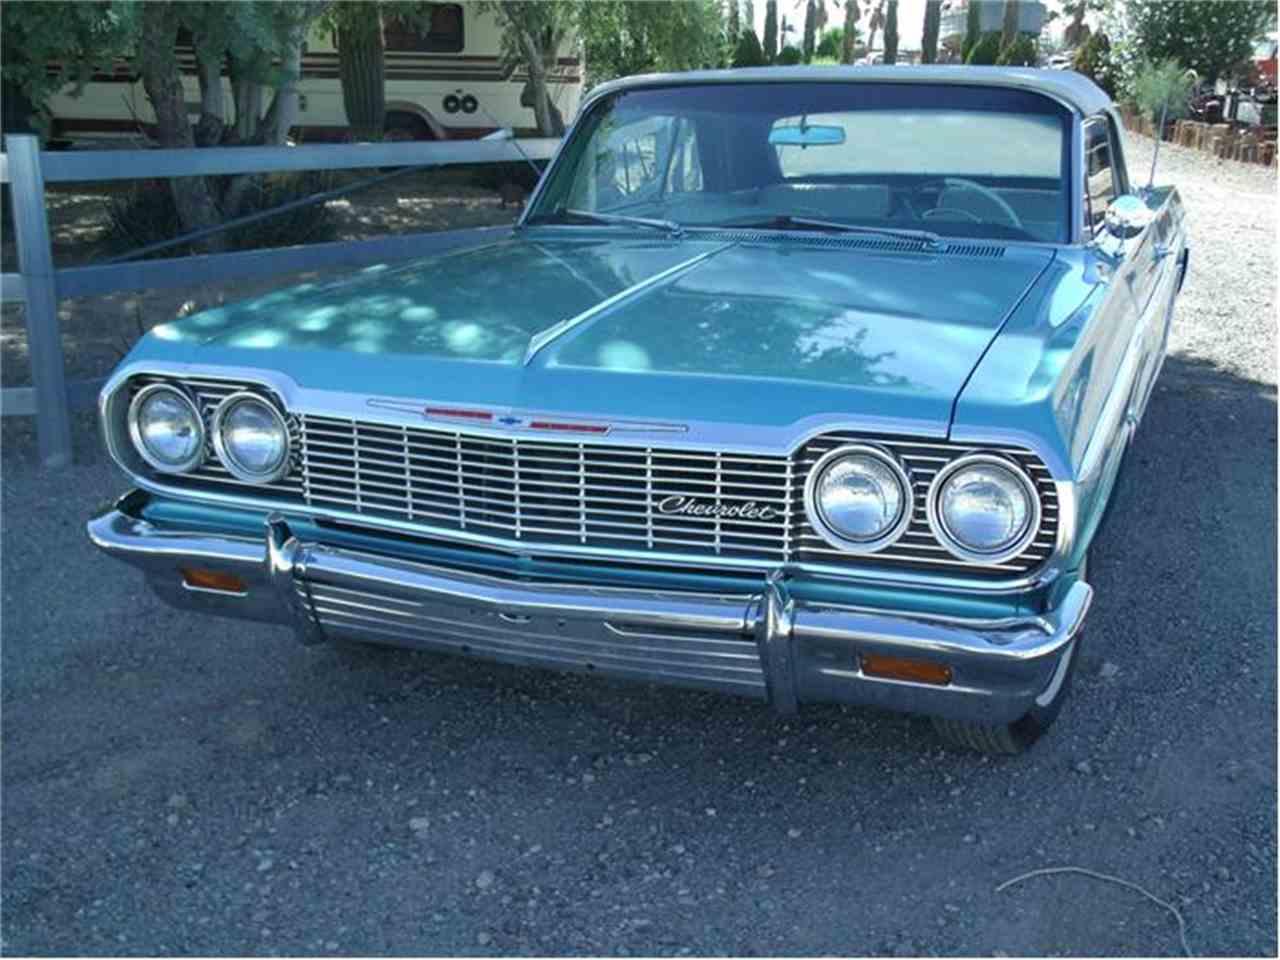 Large Picture of '64 Impala SS located in Quartzsite Arizona - $58,980.00 - 9OT6